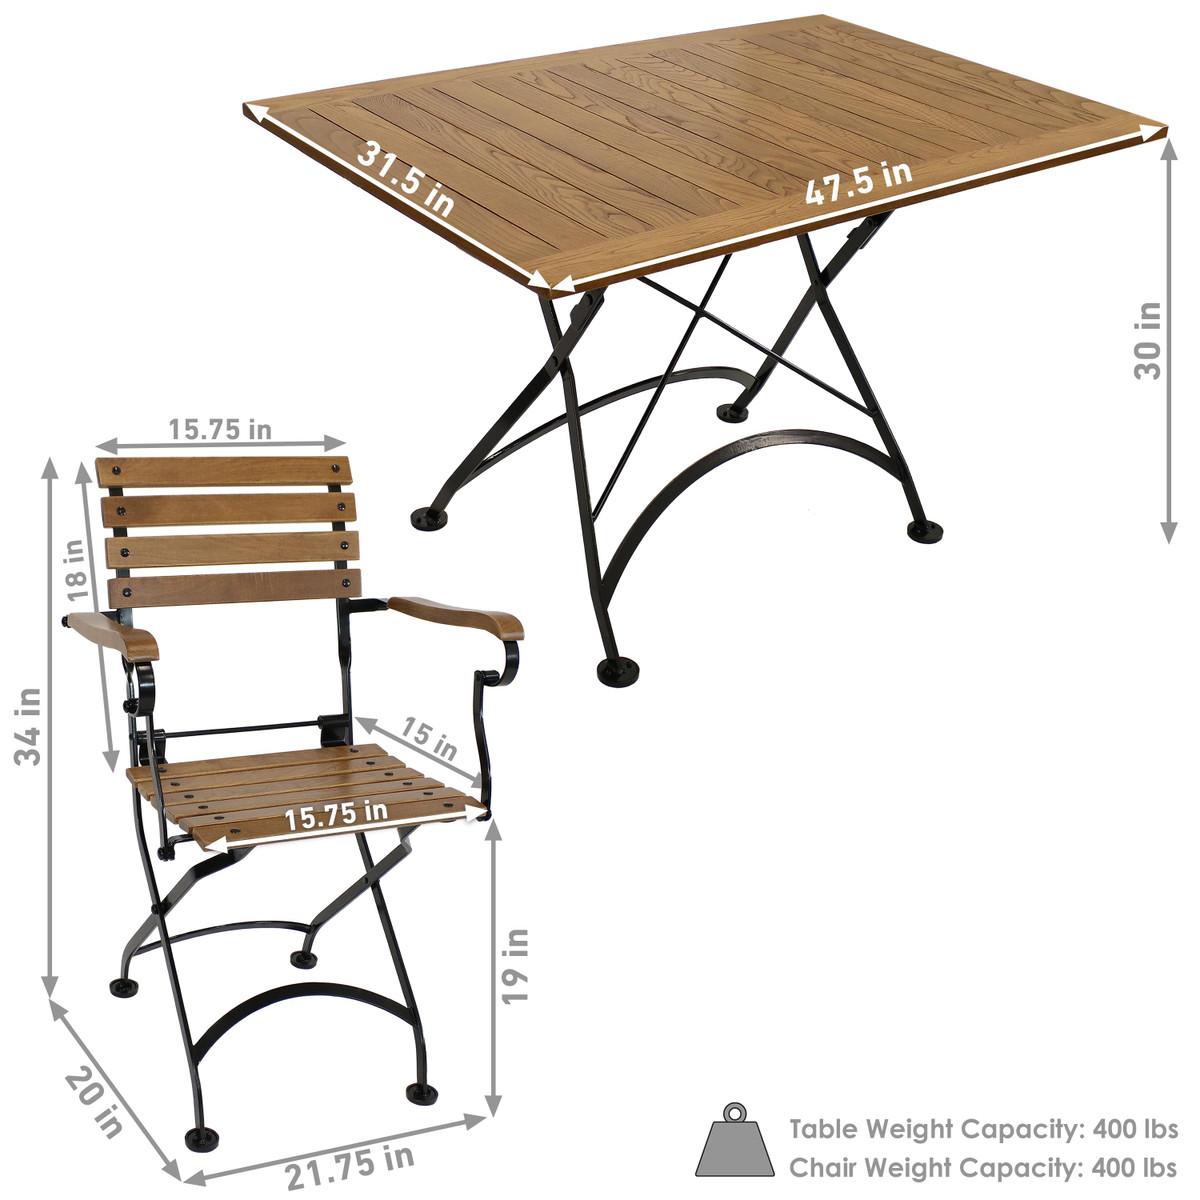 - Sunnydaze Essential European Chestnut Wood 5-Piece Folding Table